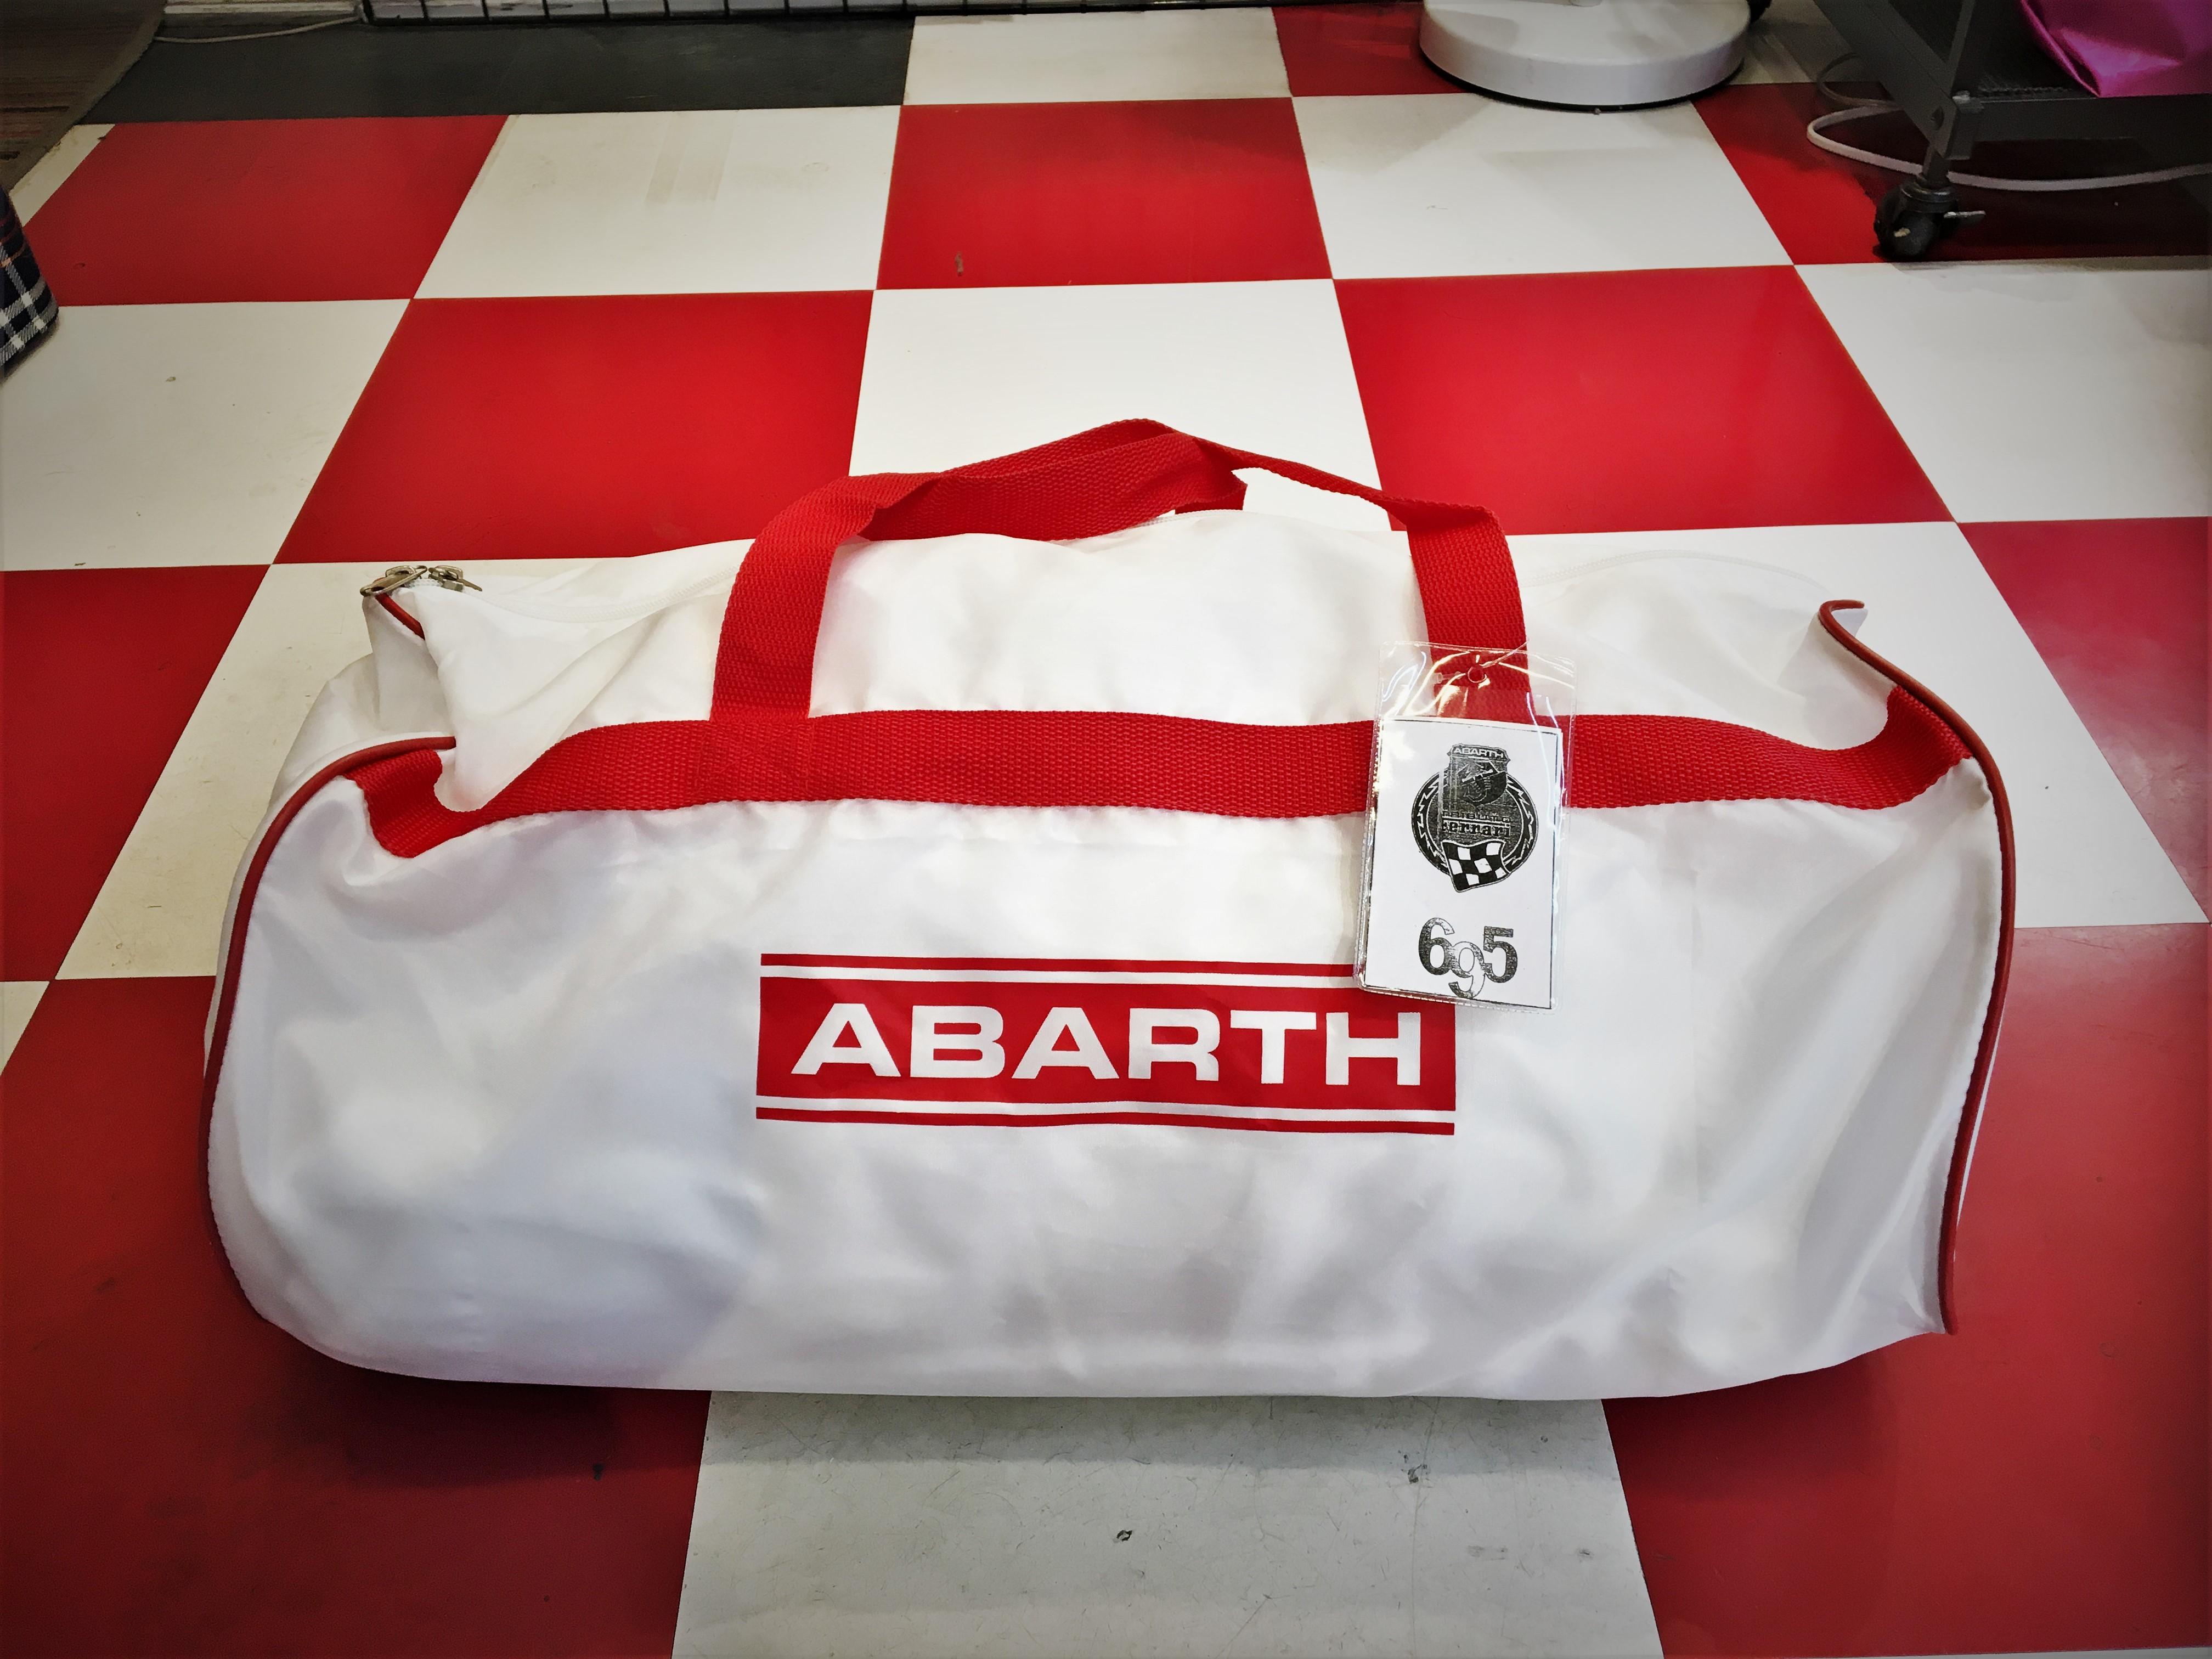 Abarth 695 TRIBUTO FERRARI 純正品 ボディカバー